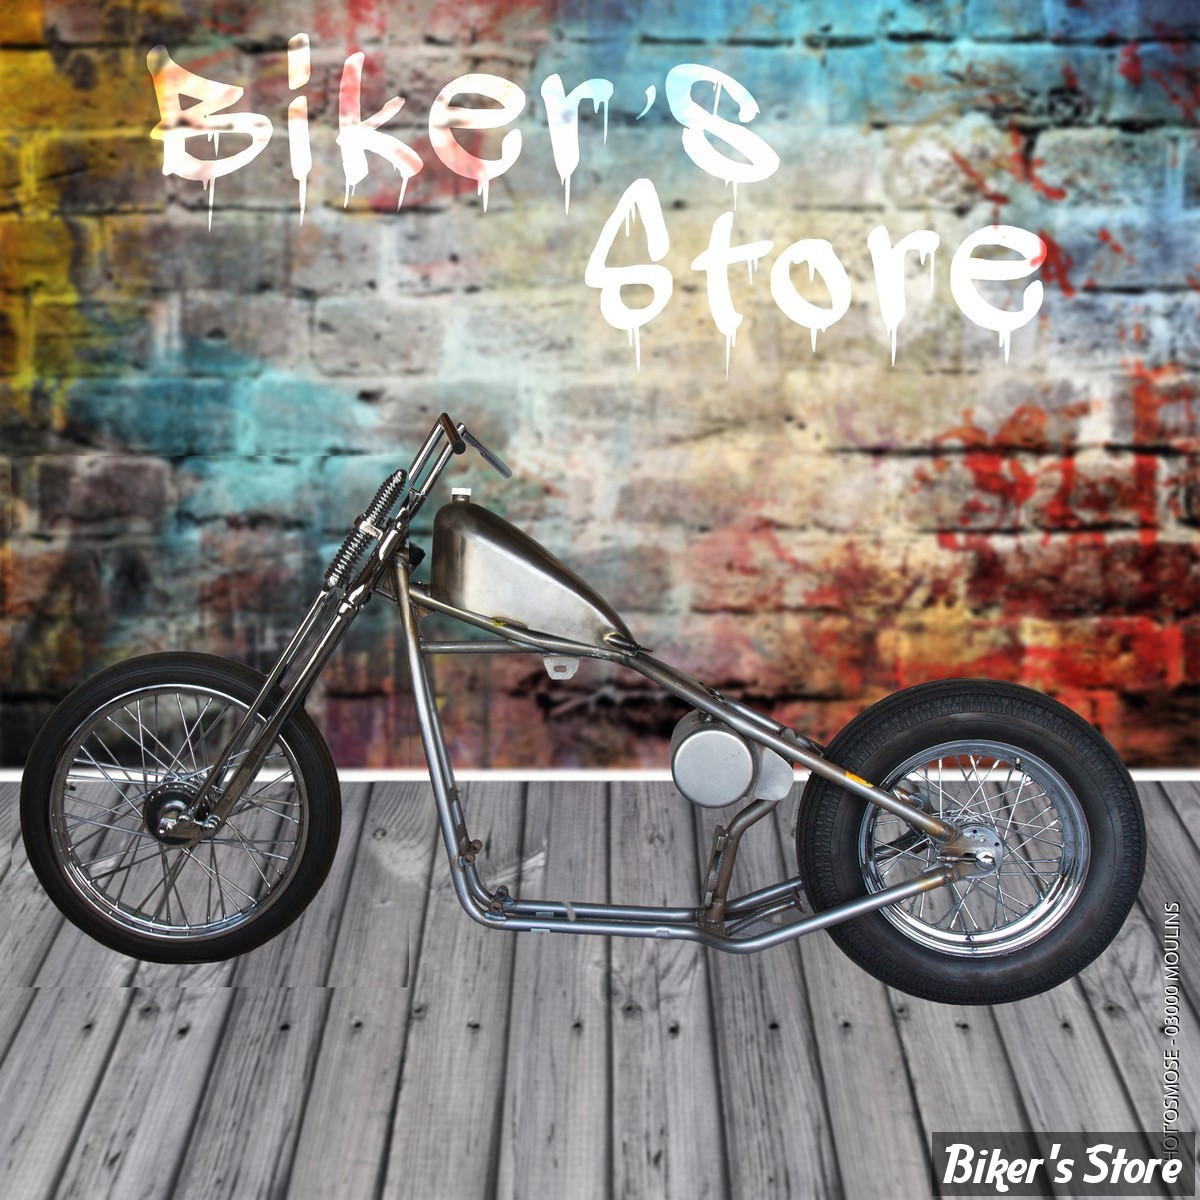 PARTIE CYCLE - SPORTSTER 86/03 - BIKER'S STORE - BOBBER RIGIDE - FOURCHE SPRINGER